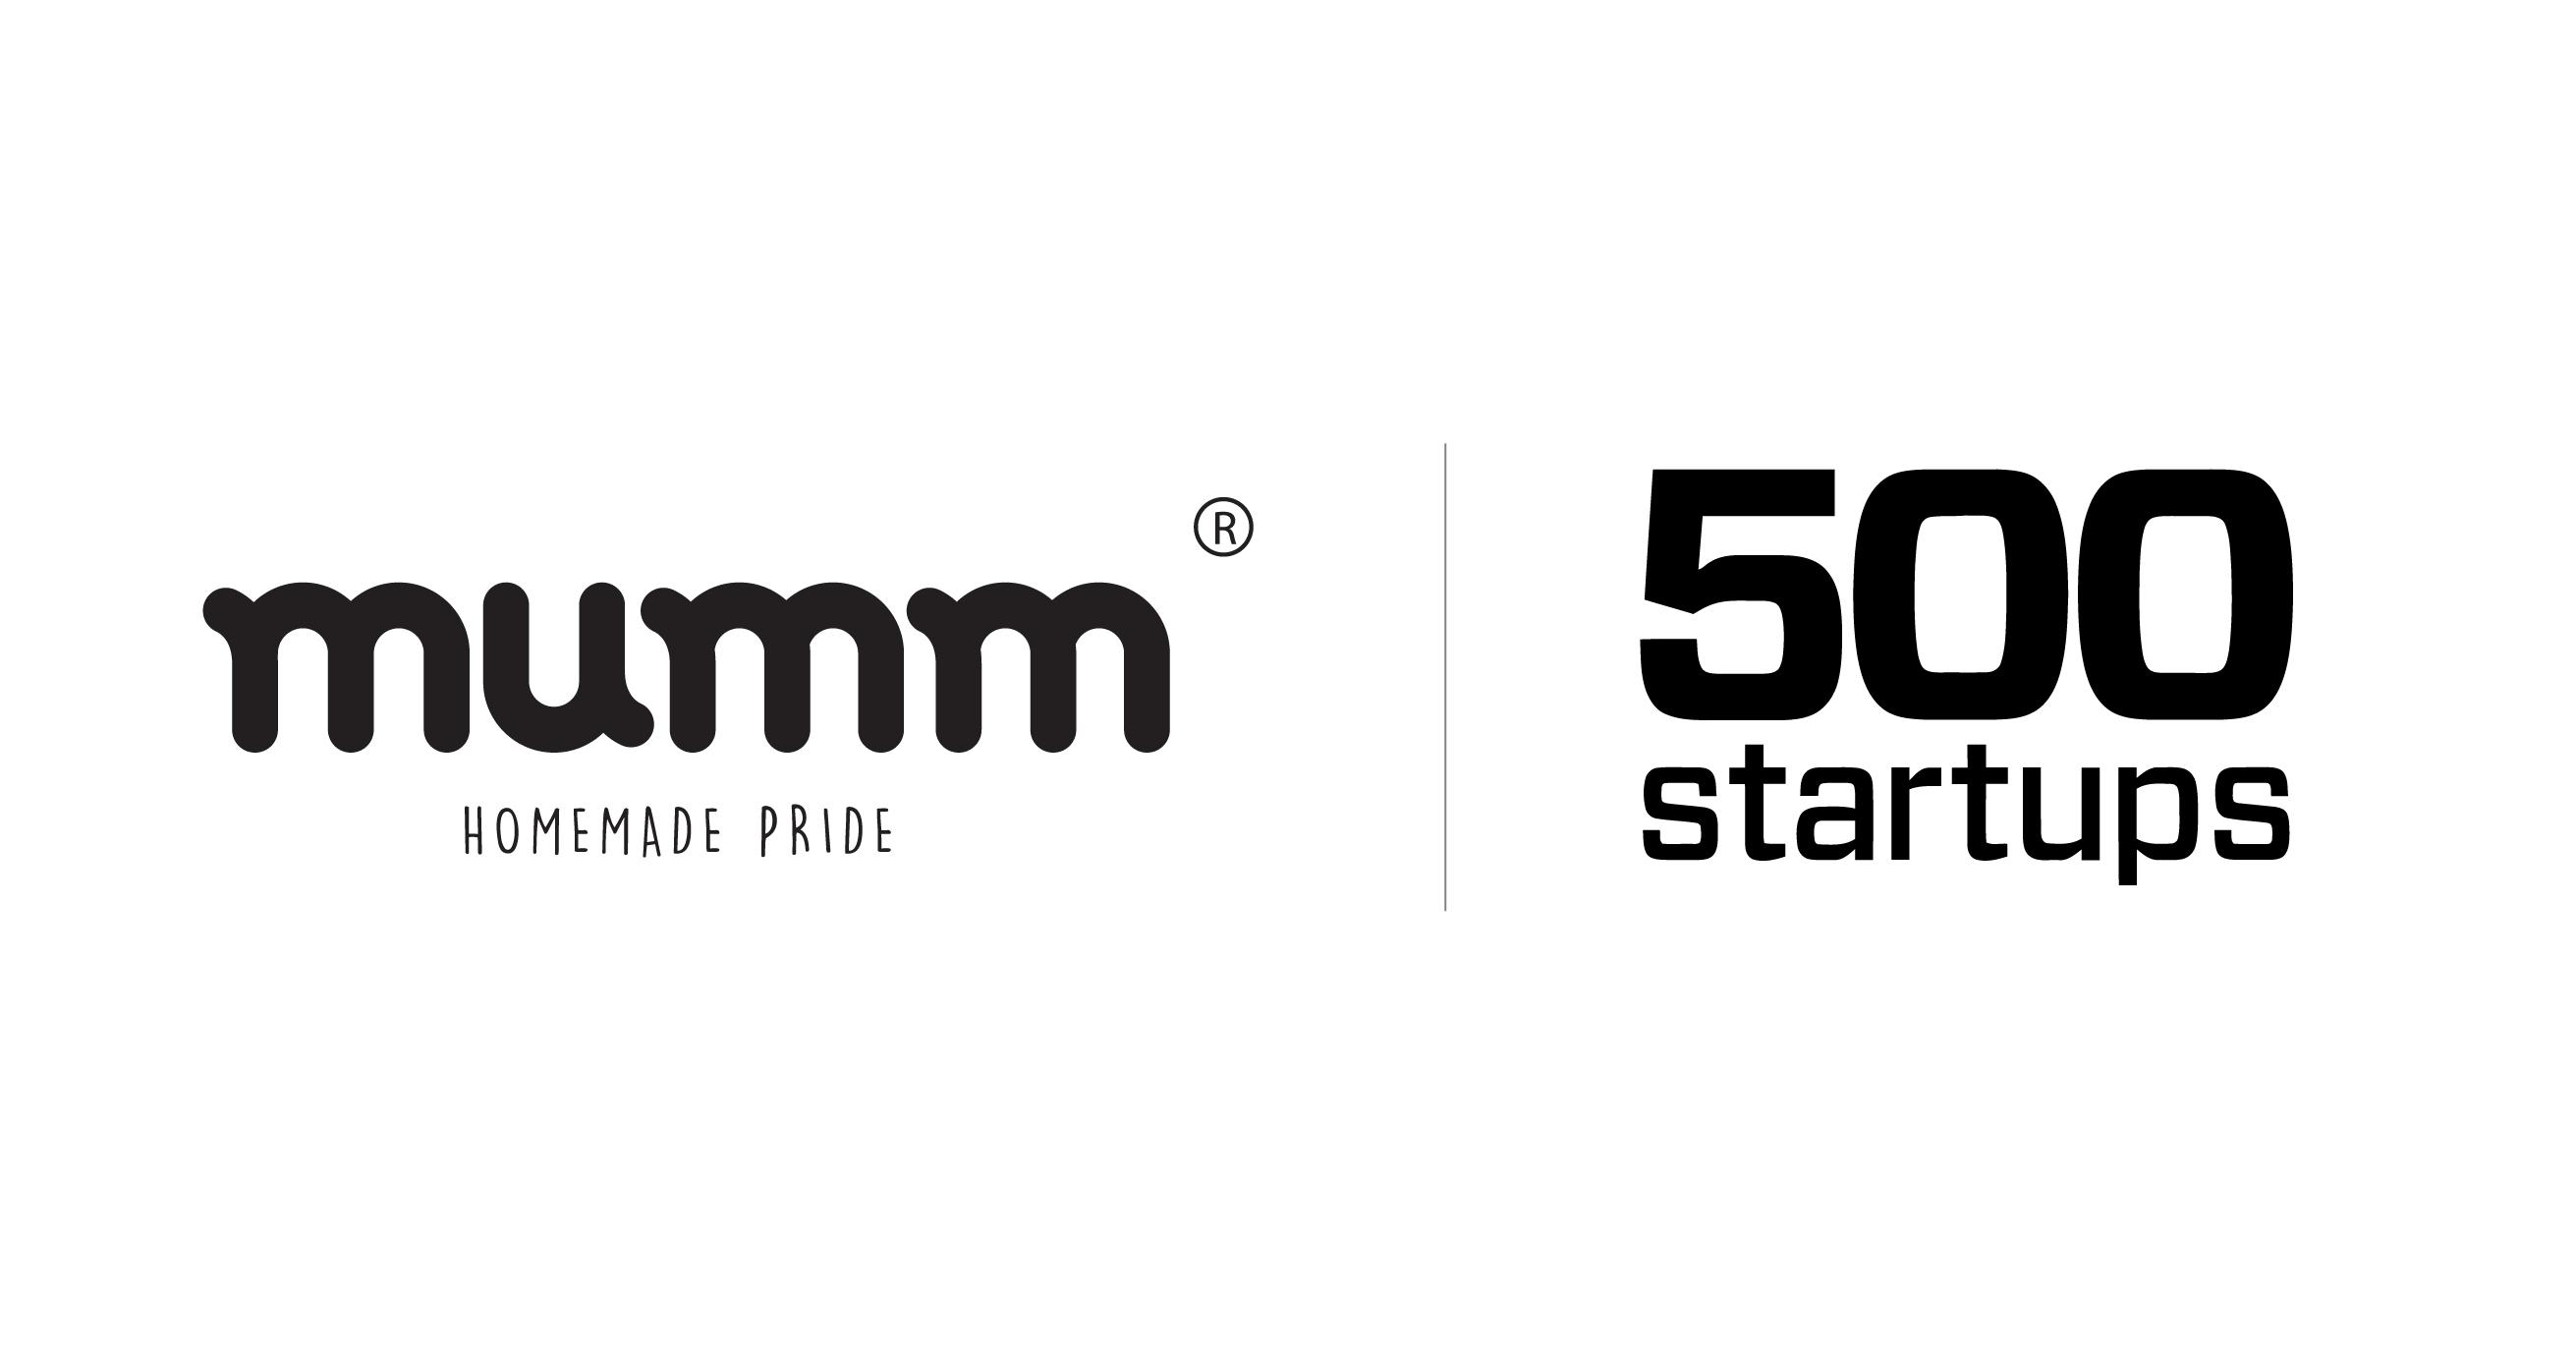 Mumm, the online homemade food platform, receives an investment from 500 Startups